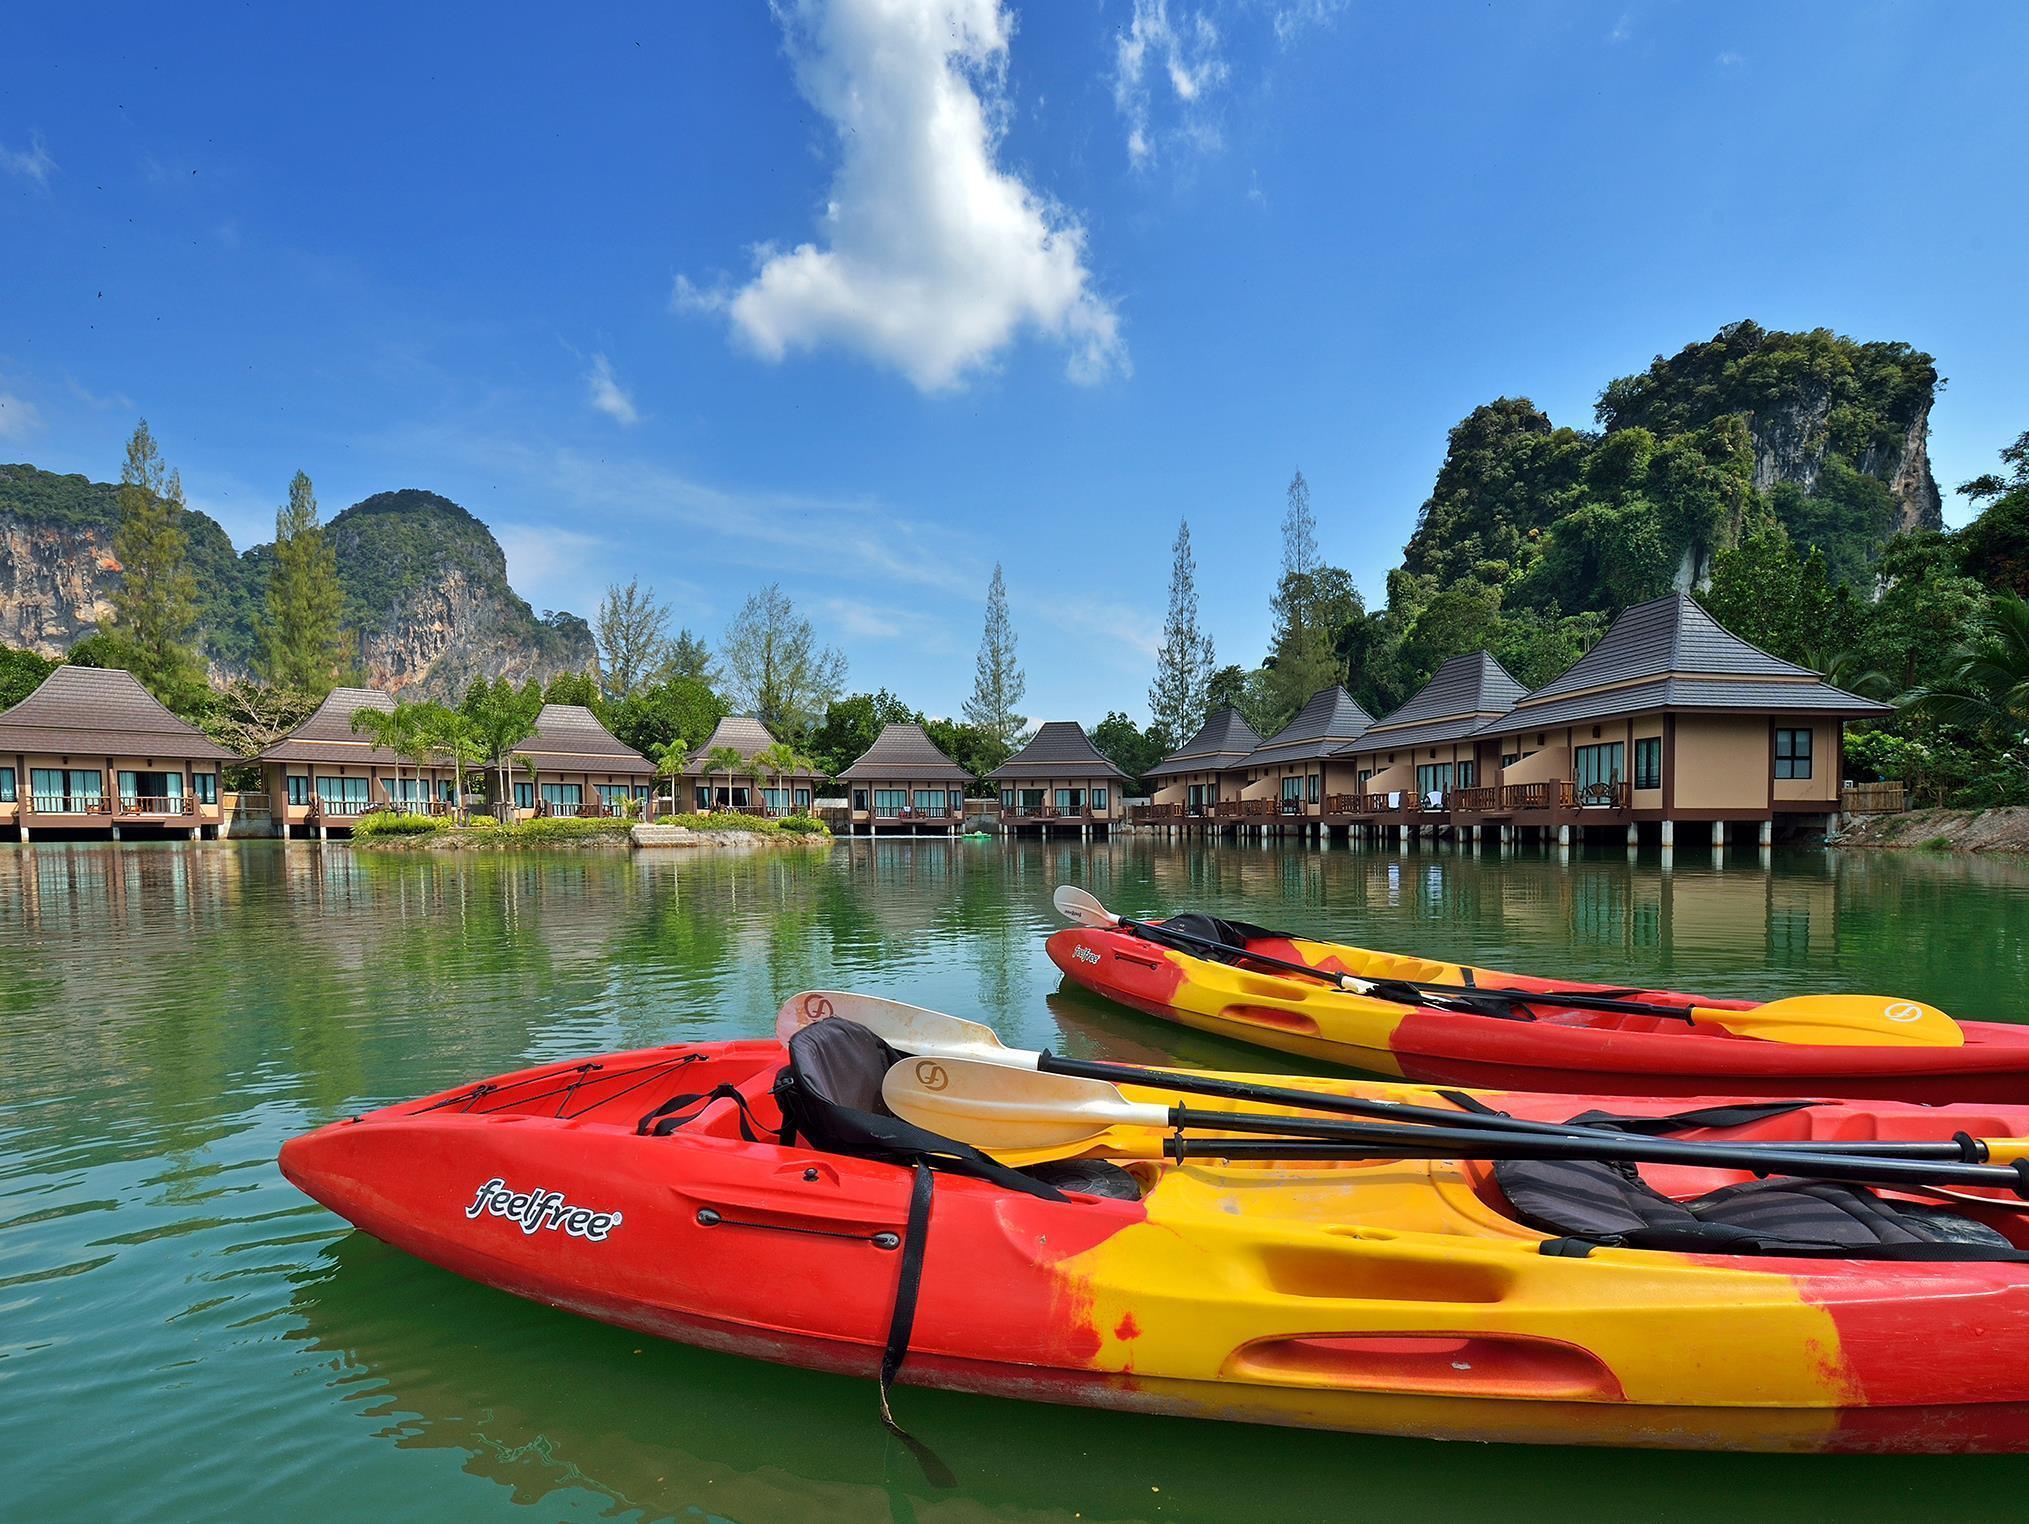 Poonsiri Resort Aonang พูนศิริ รีสอร์ต อ่าวนาง